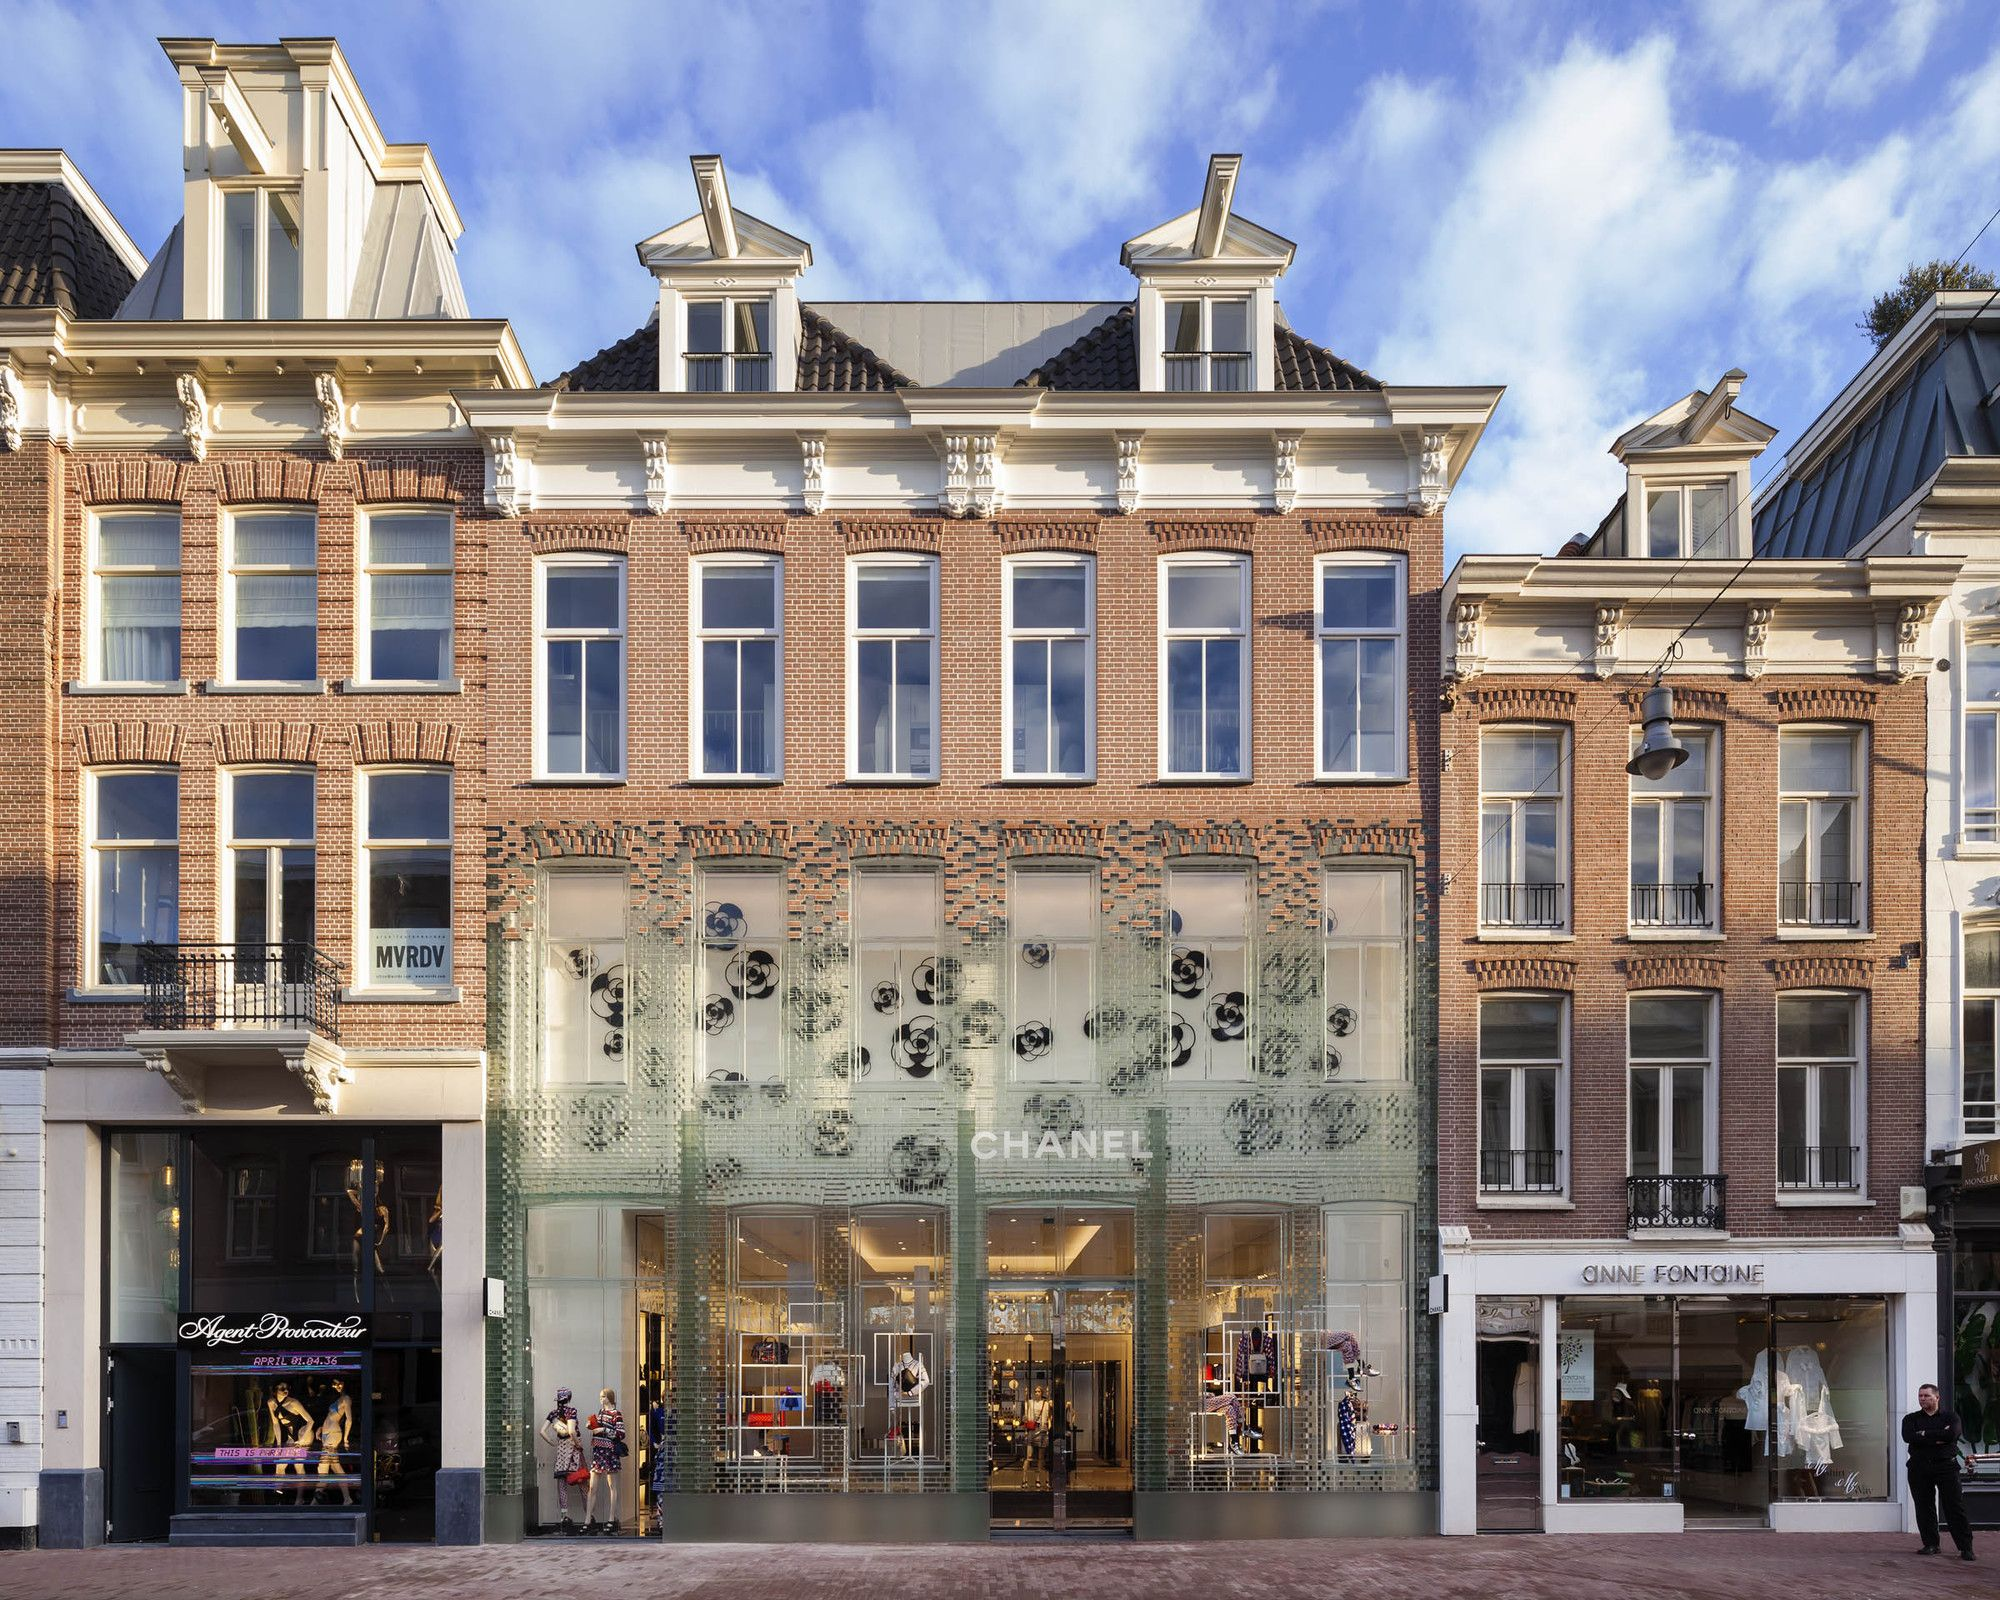 Crystal Houses Mvrdv Brick Facade Amsterdam Houses Glass Facades